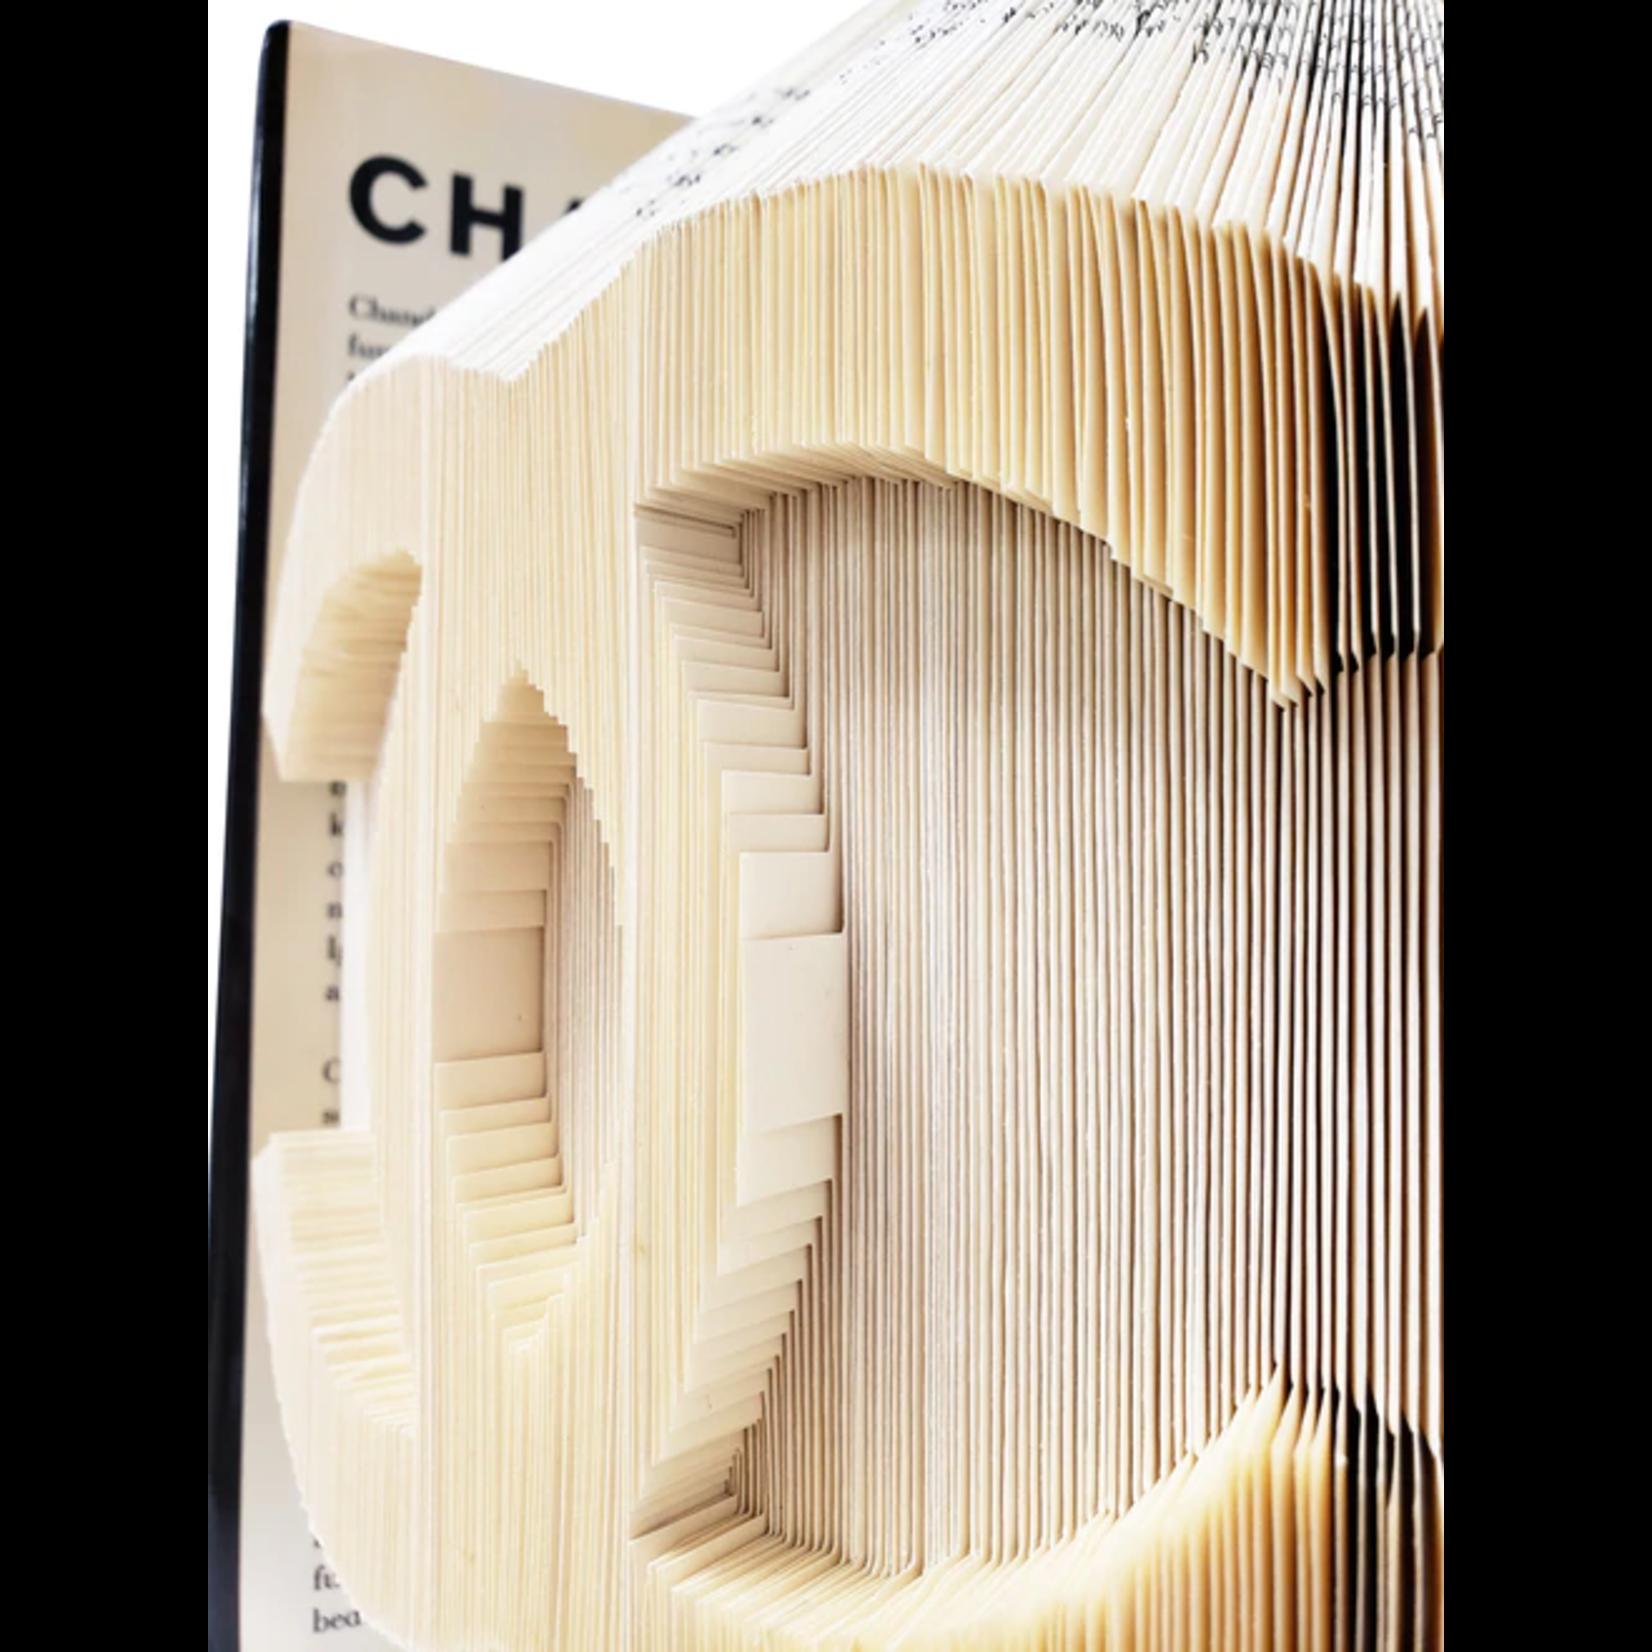 Folded Fiction Designer Book Art CC